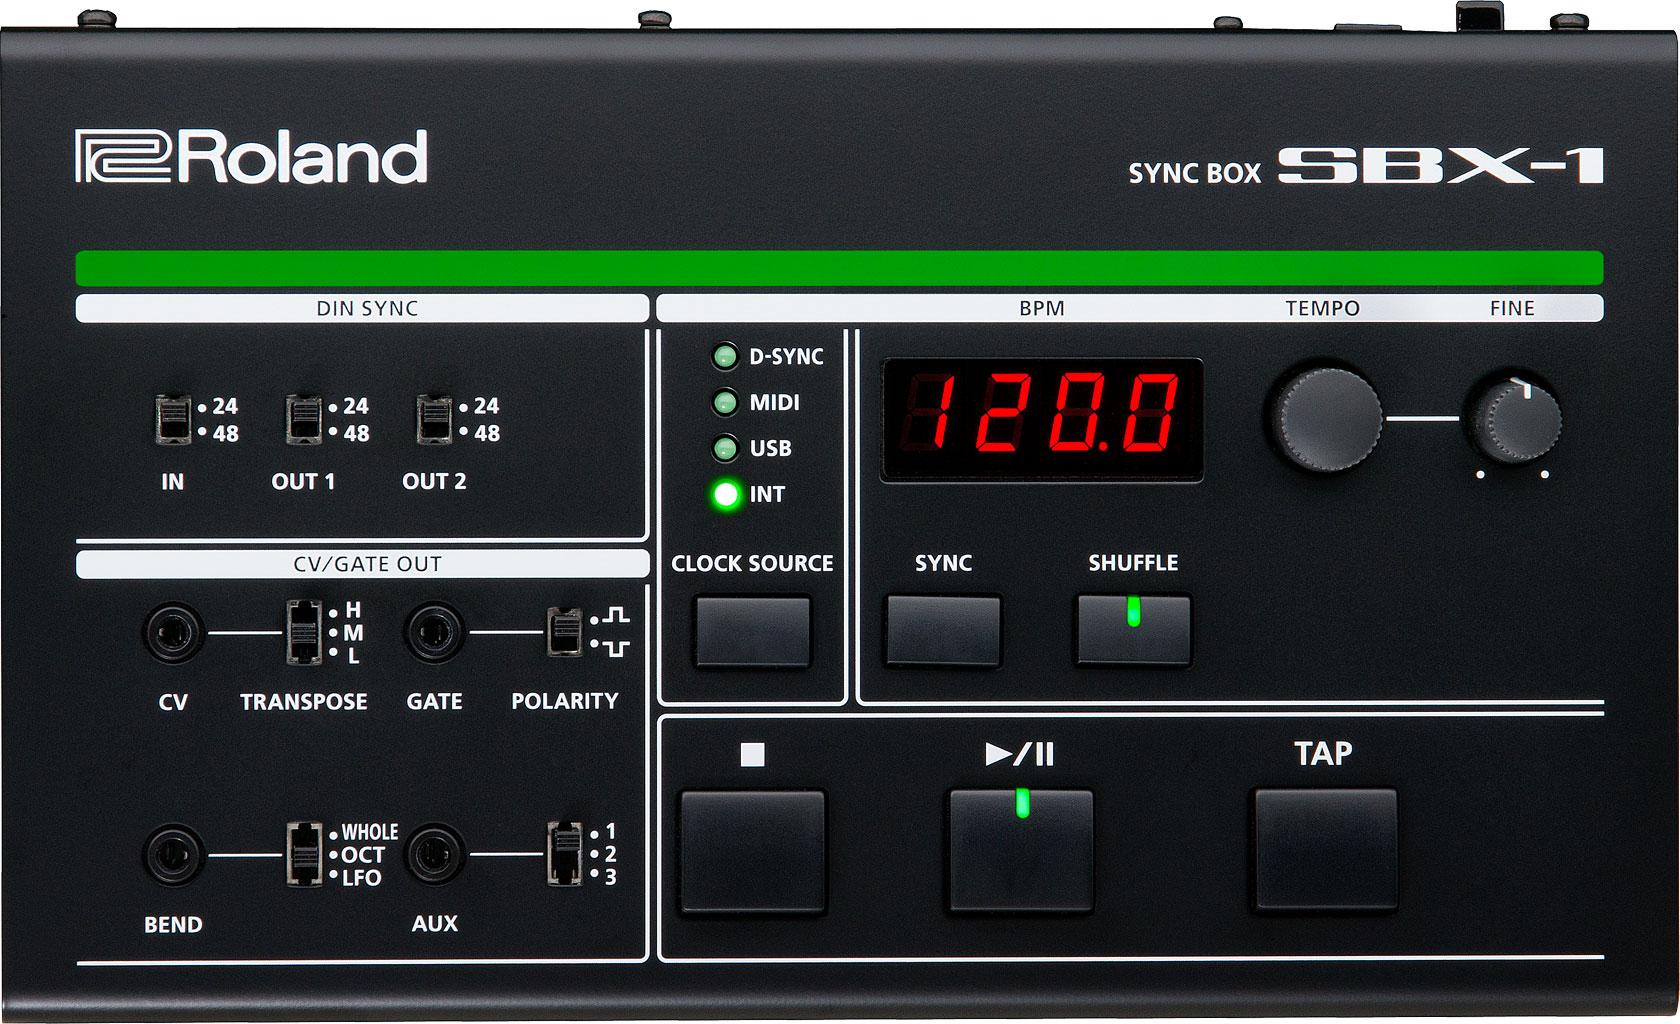 roland sbx1 sync box  usb  midi  din  cv  gate